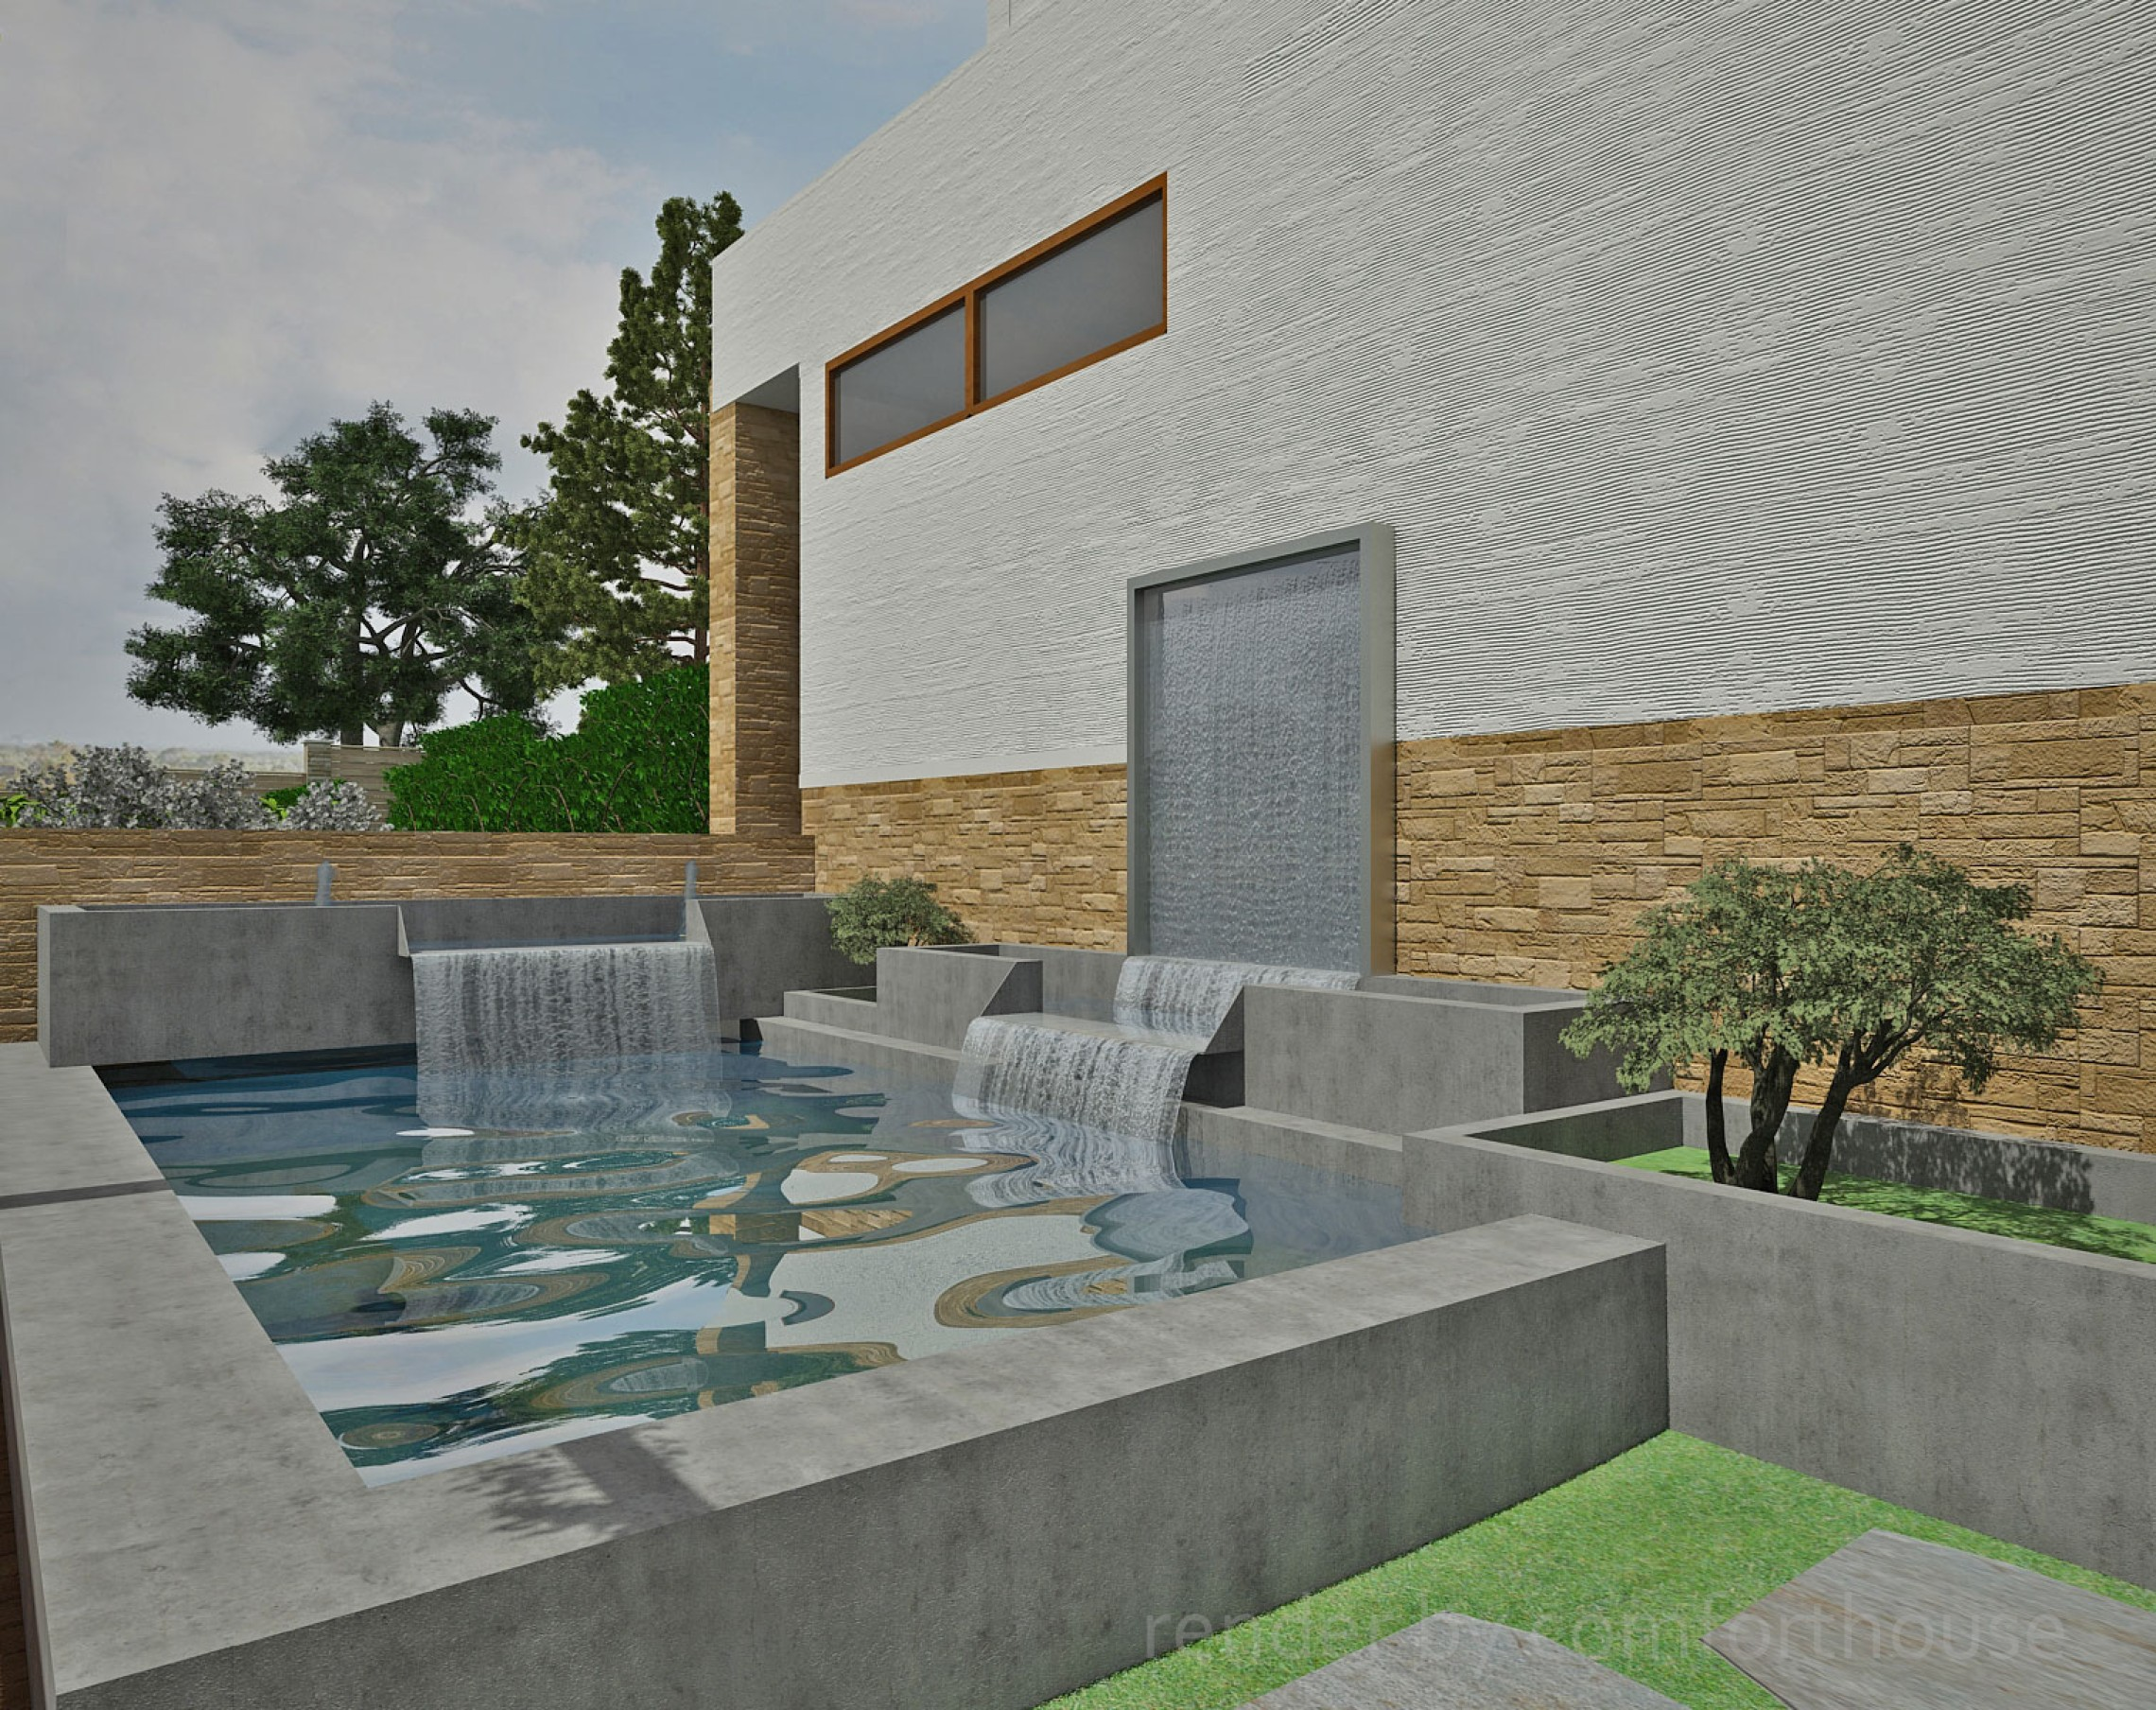 Landscape design visualization